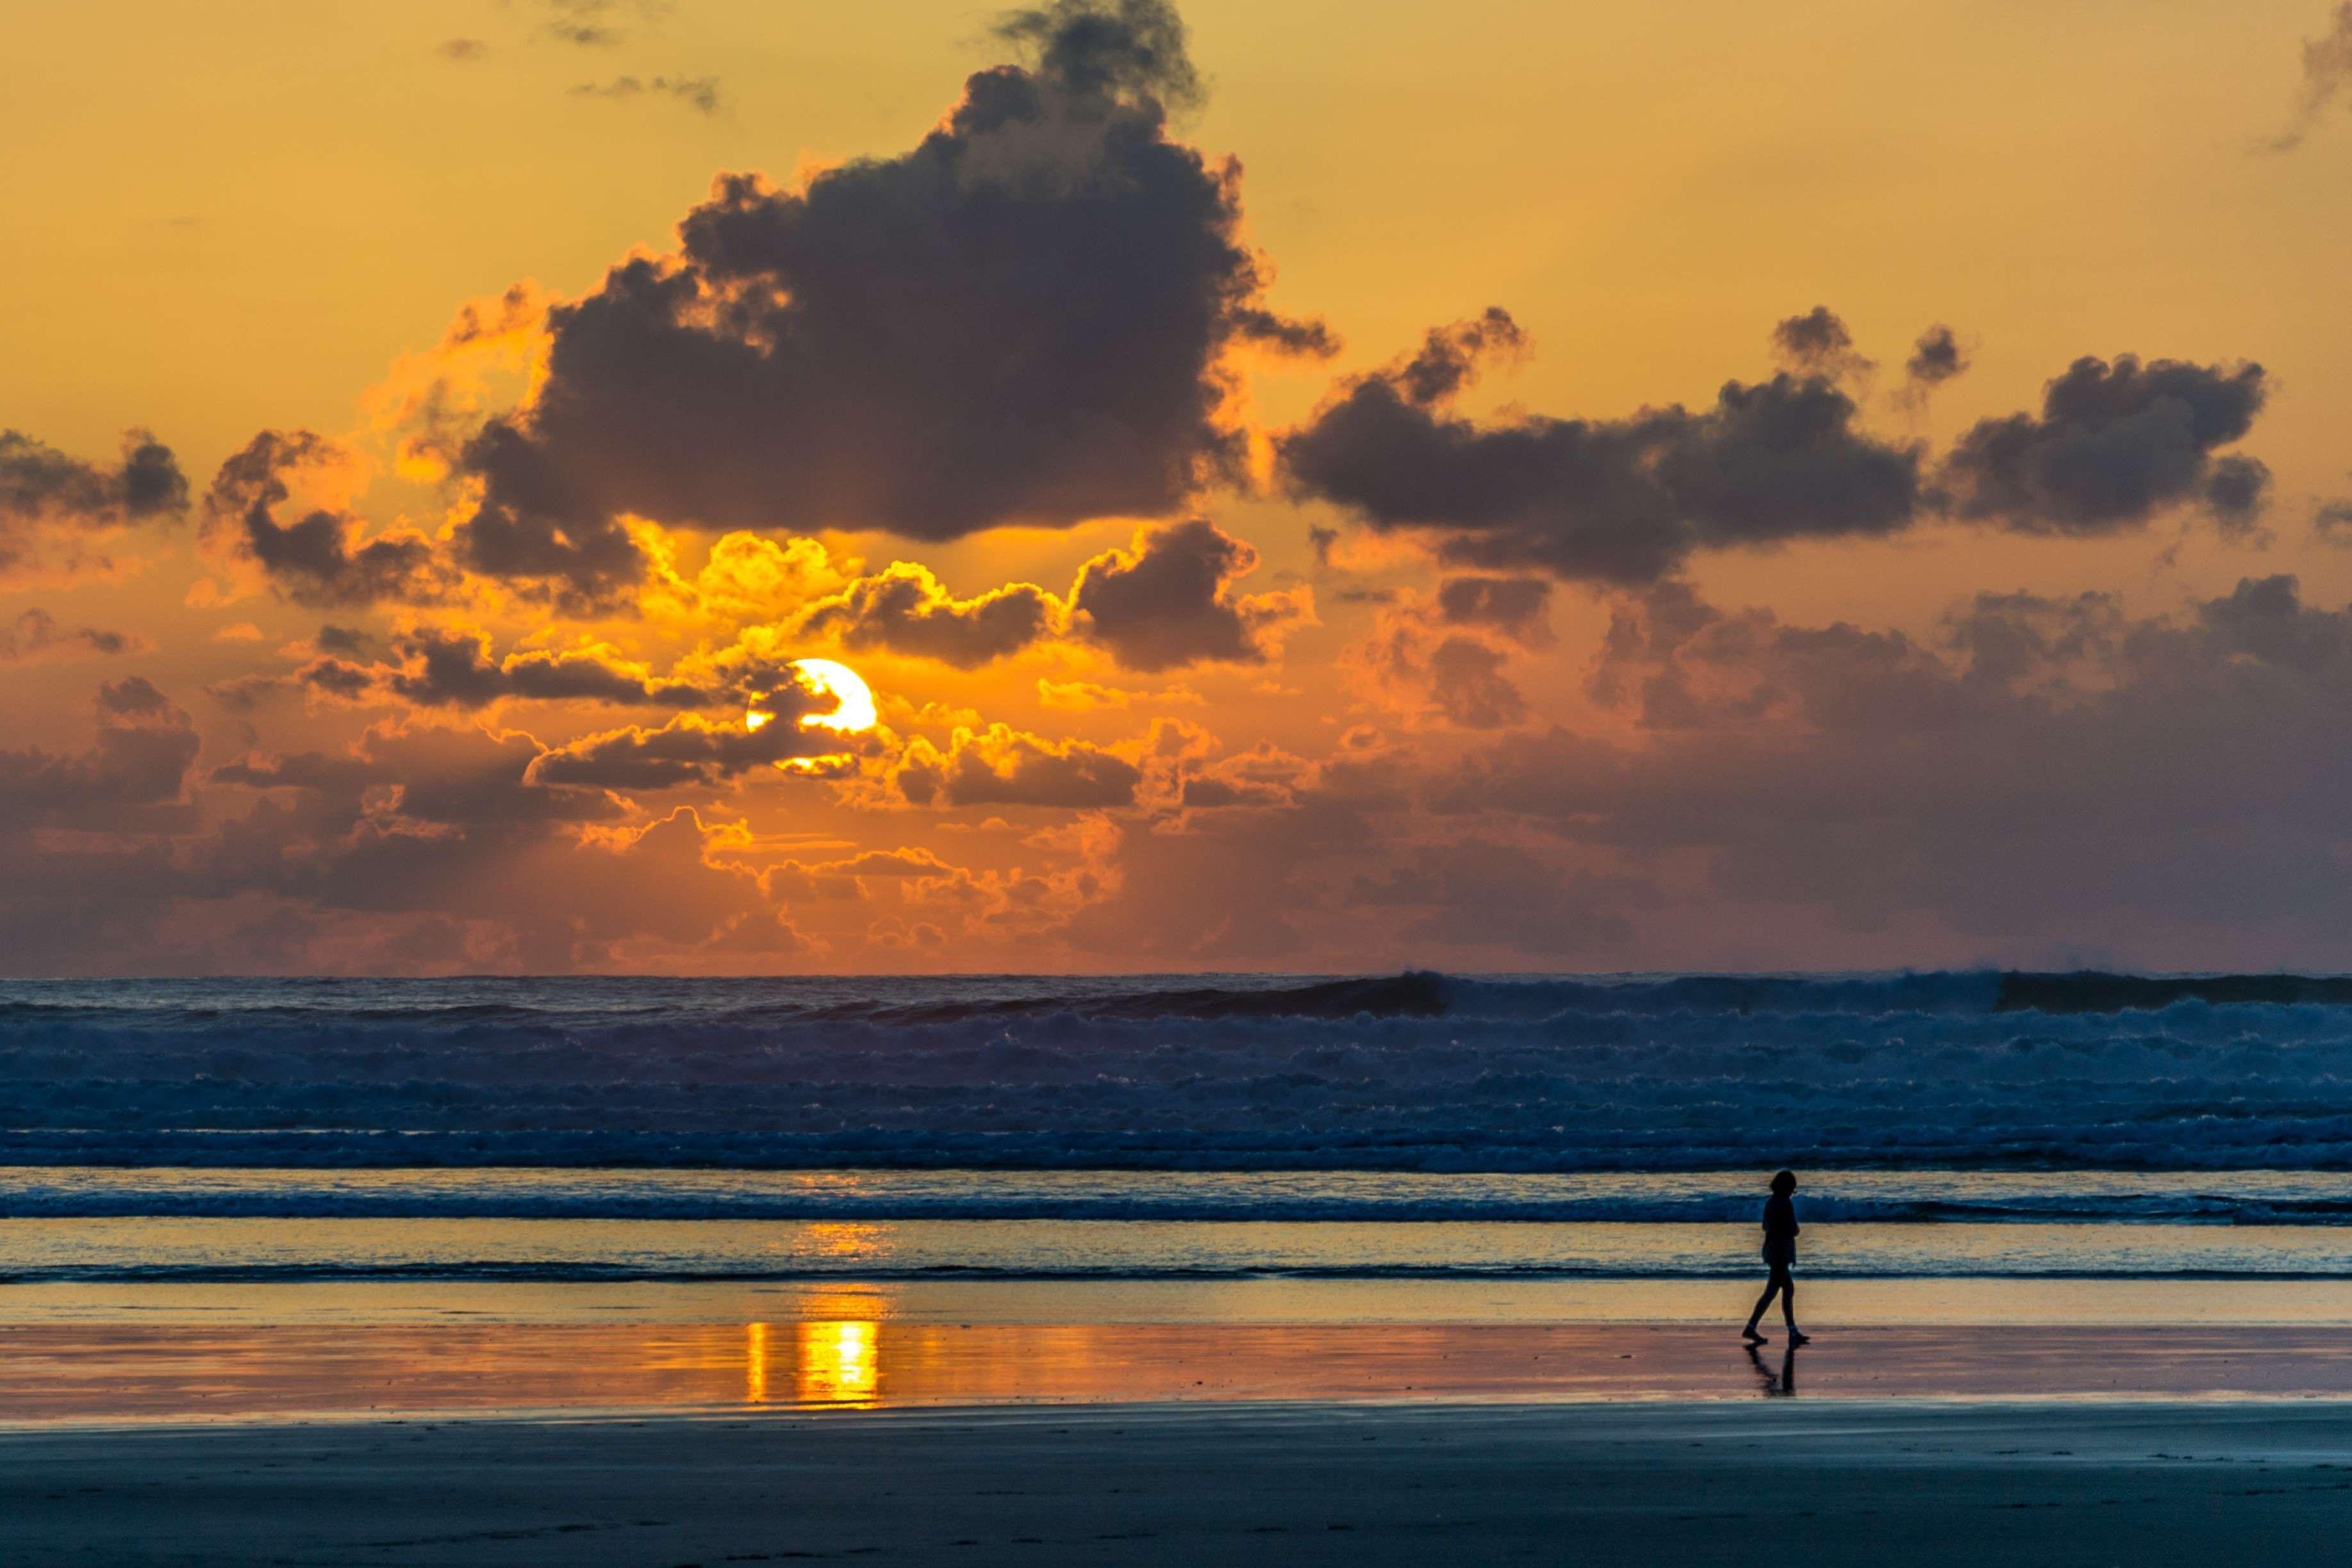 Beach Clouds Dawn Dusk Evening Horizon Island Landscape Leisure Nature Ocean Outdoors Person Recreat Sunset Pictures Sunset Beach Pictures Sunset